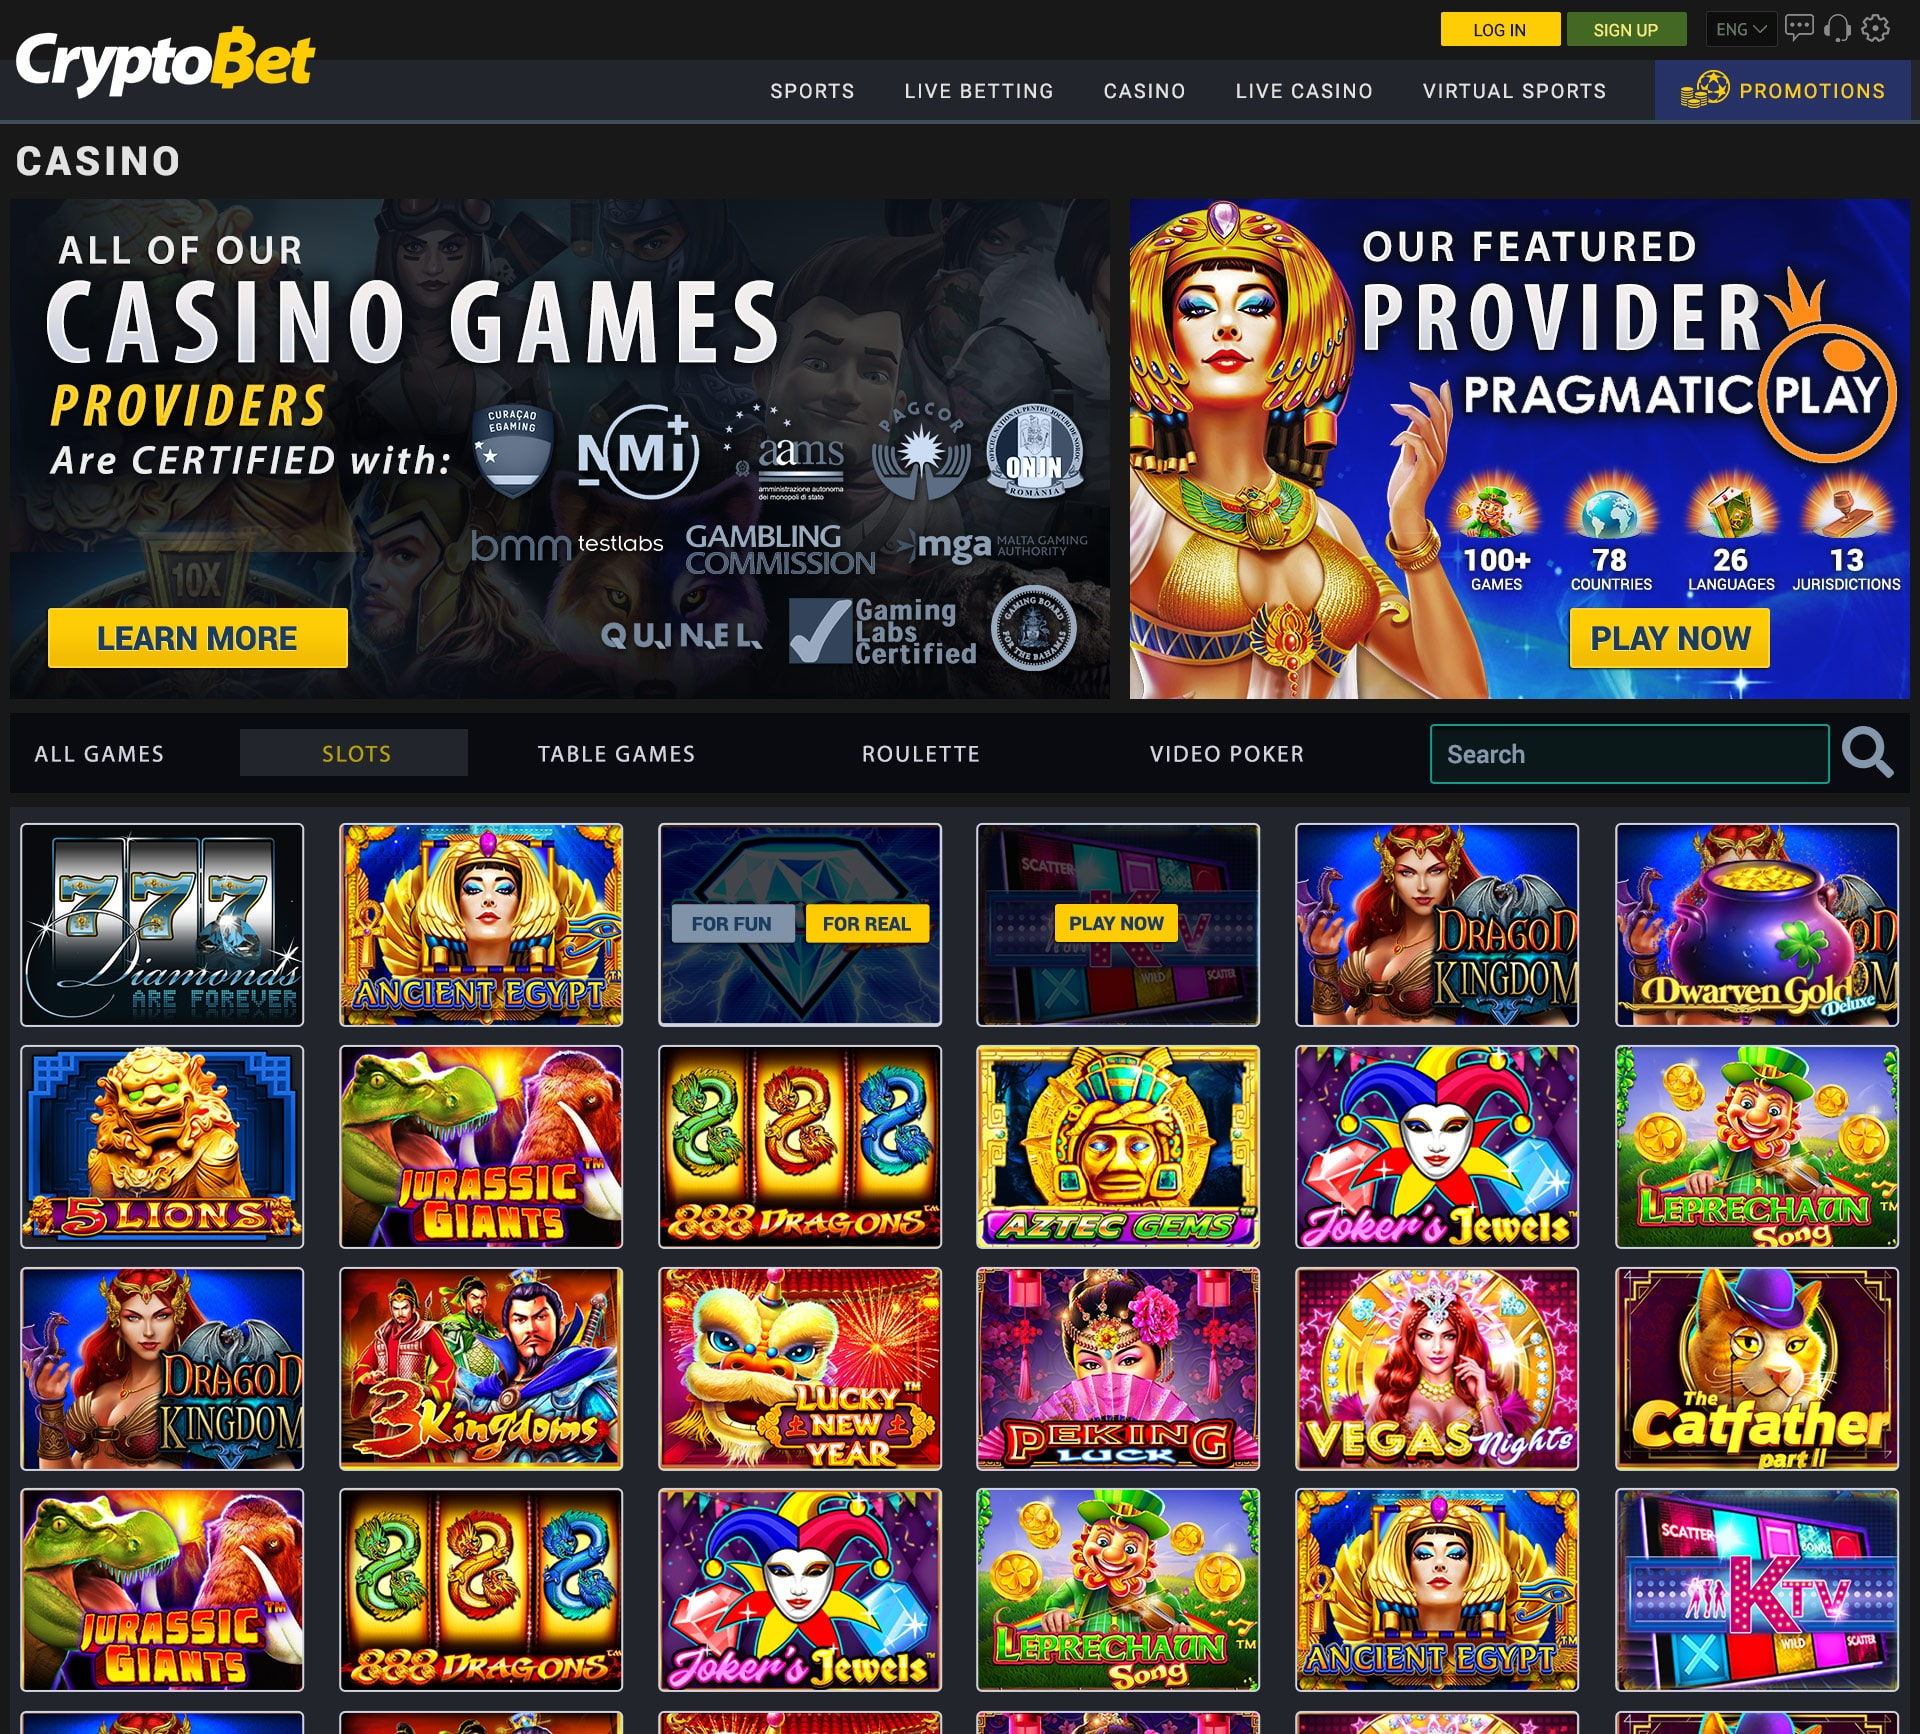 casino-lobby-2